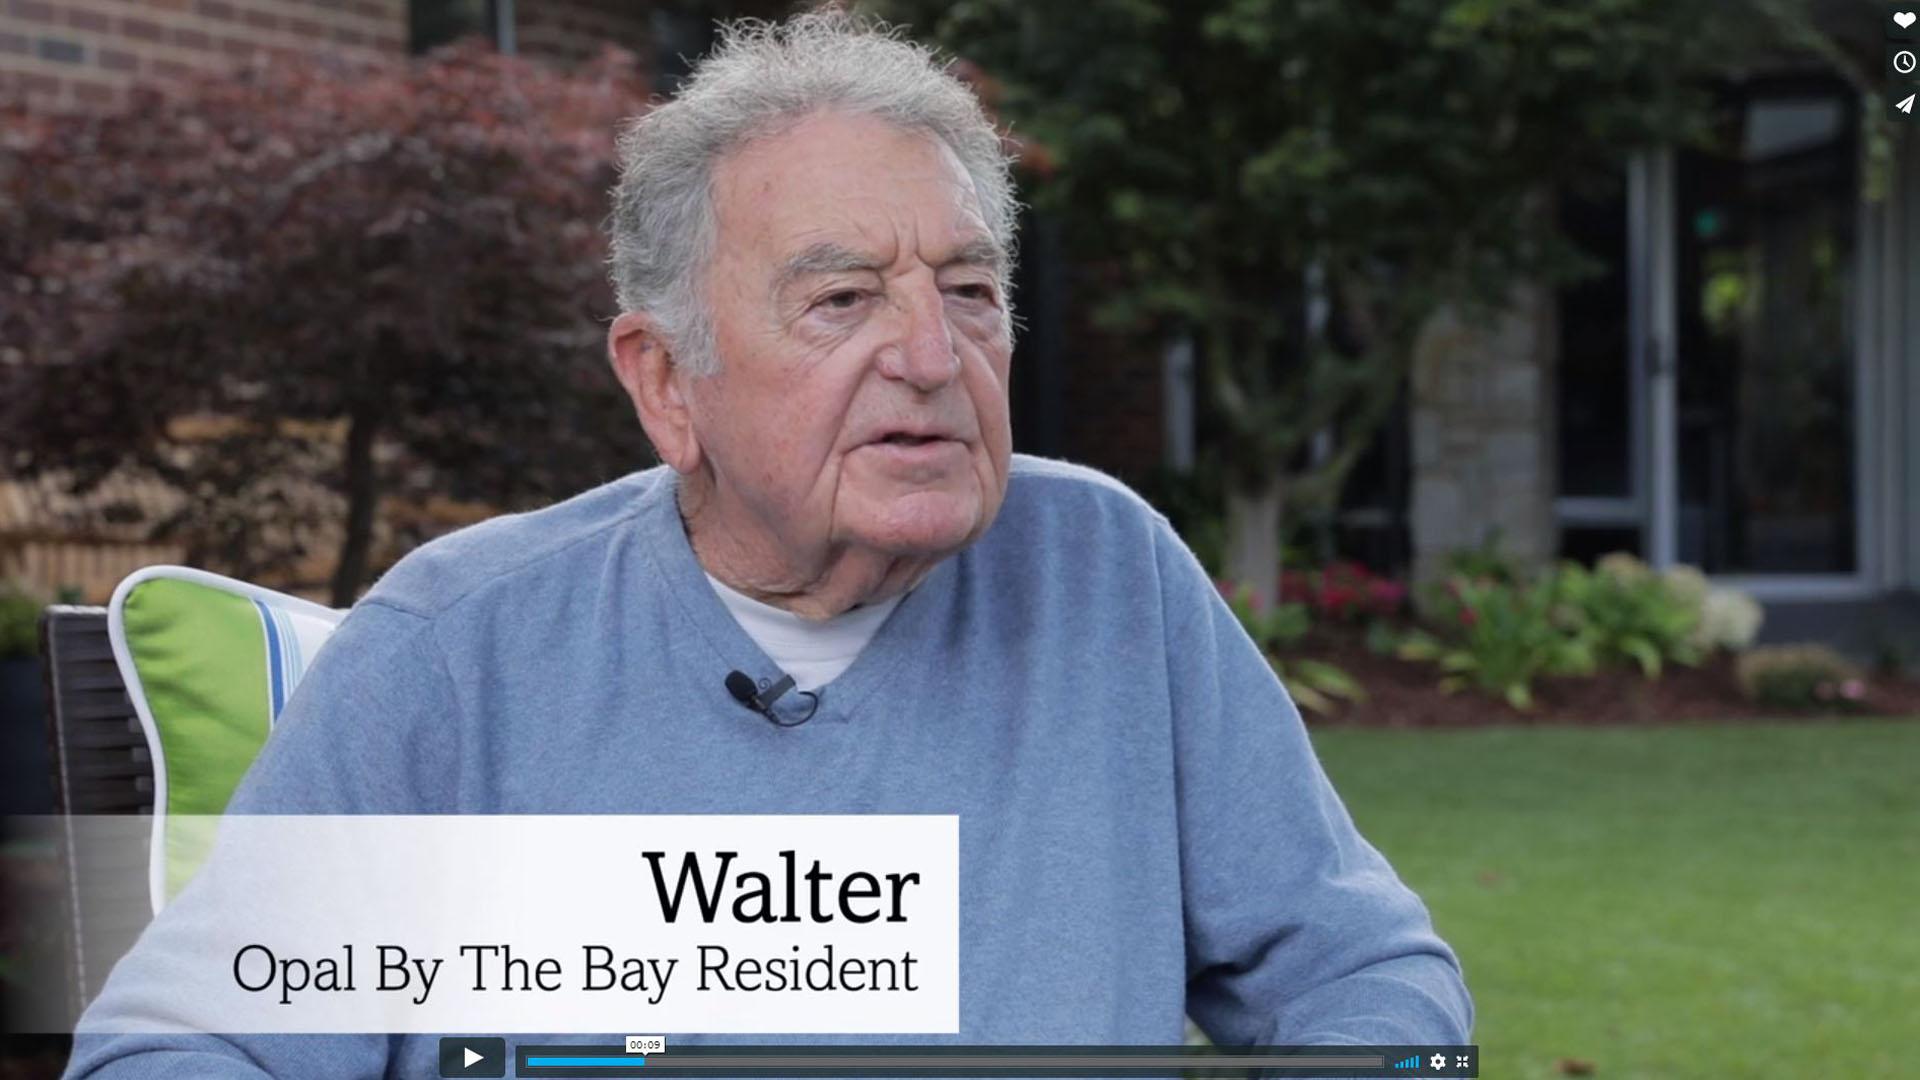 Walter's story